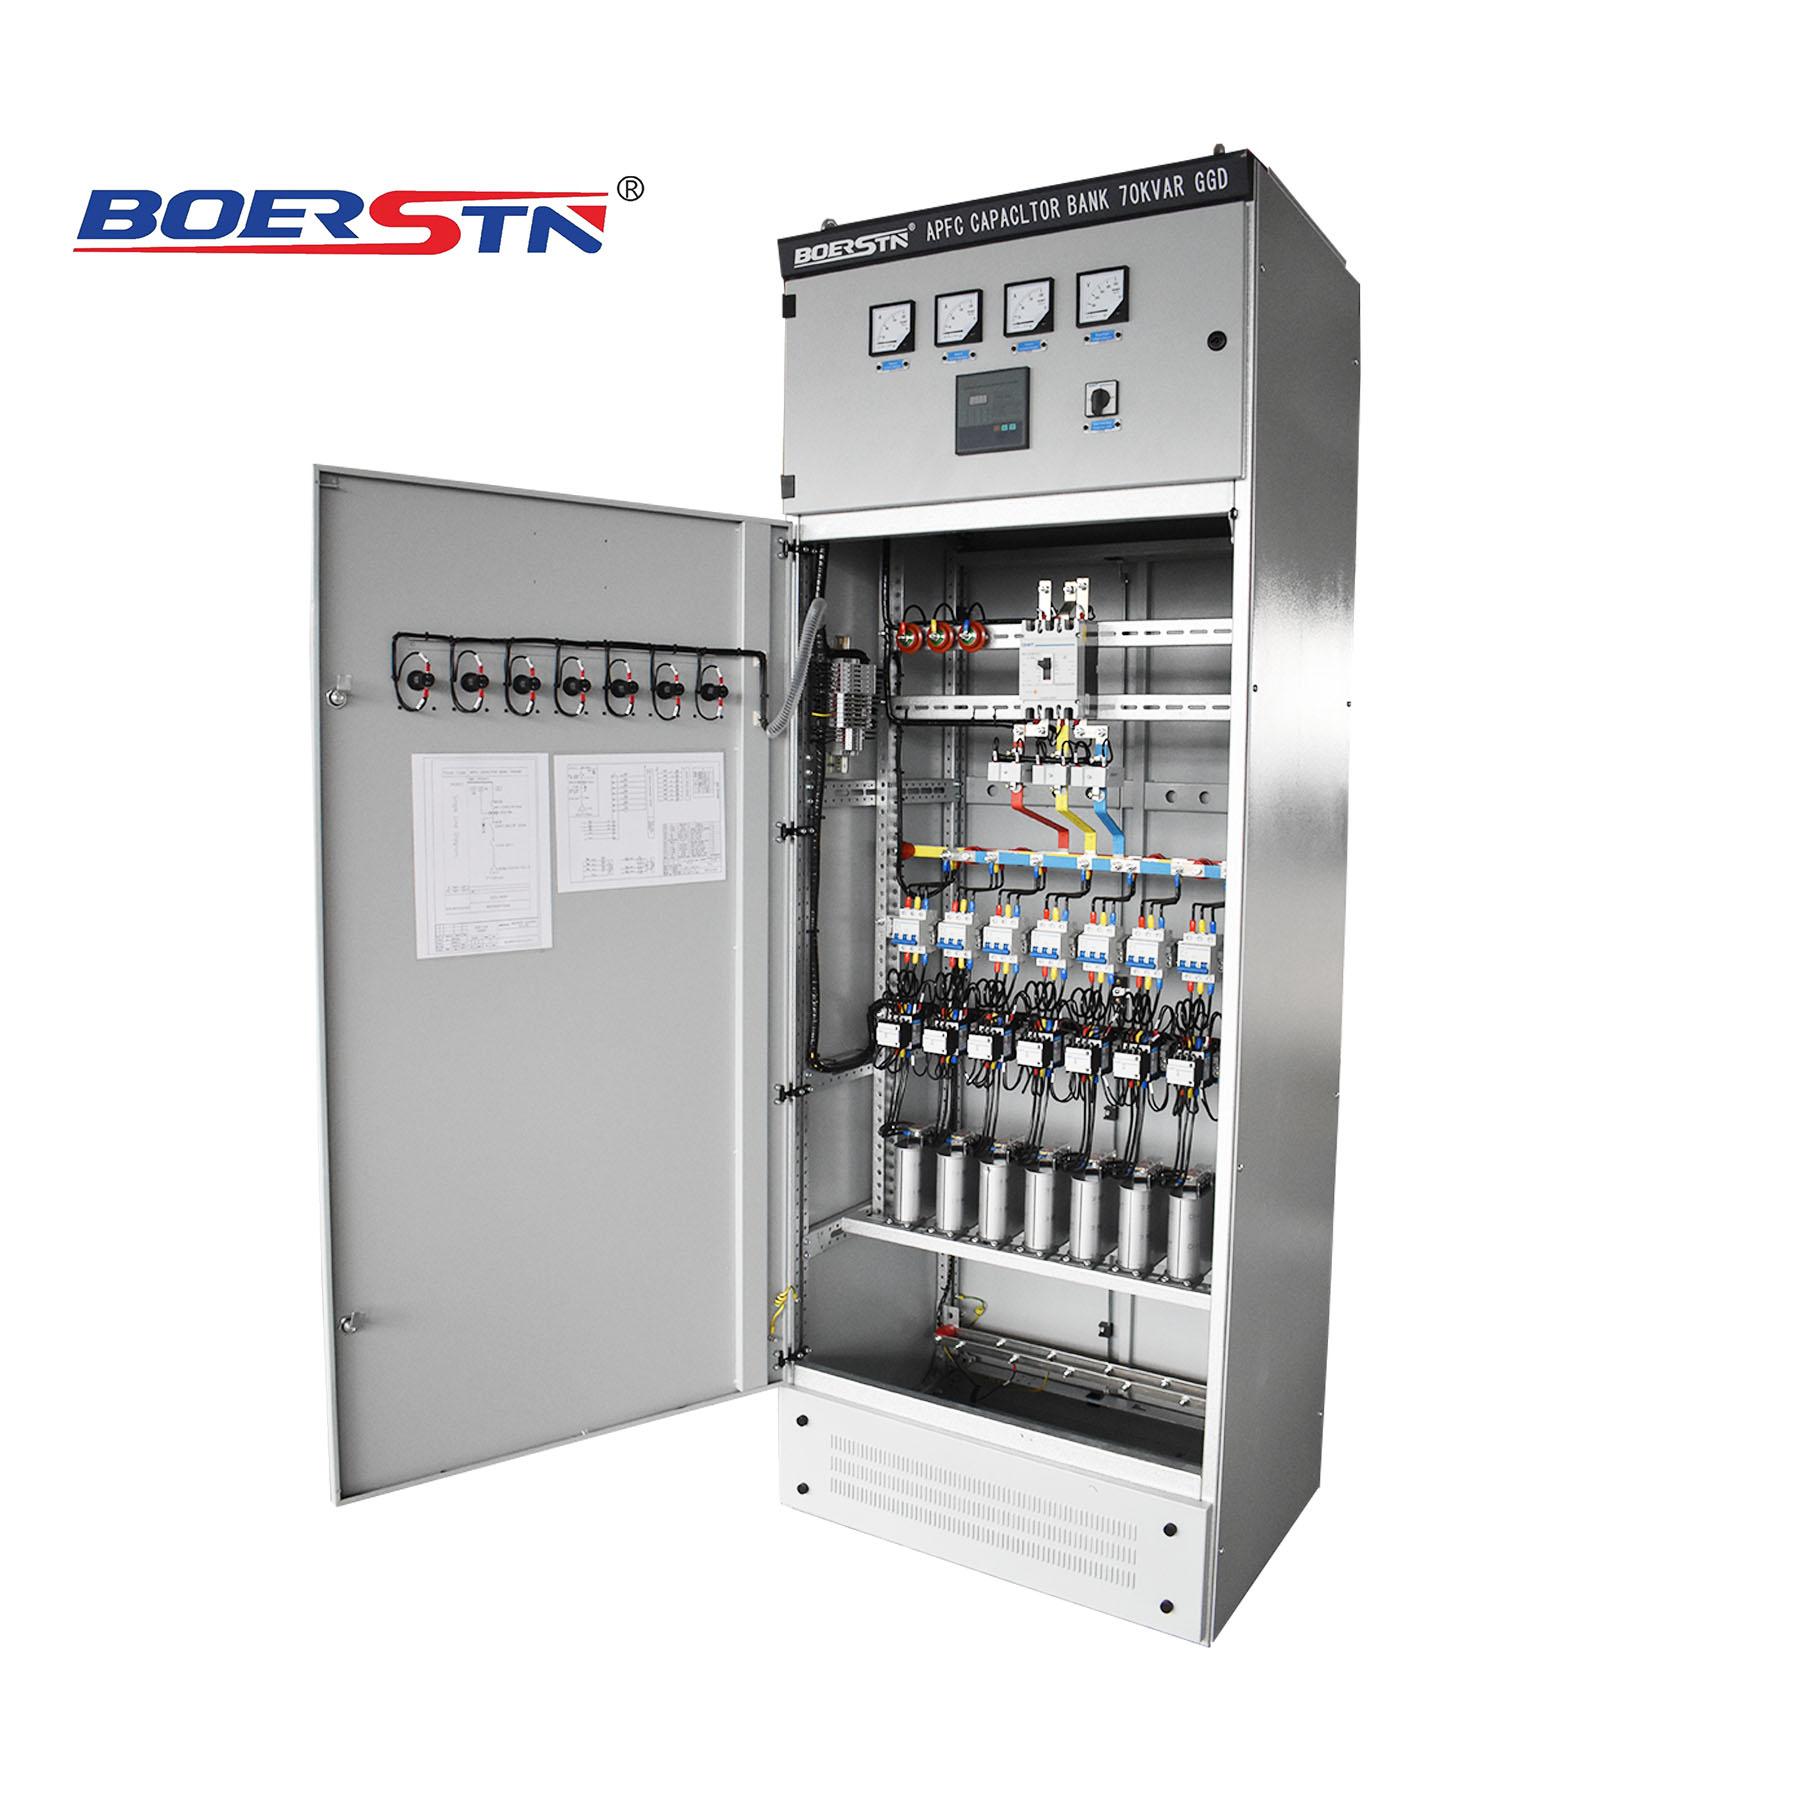 Ggd Low Voltage Electrical Capacitor Bank Compensator Kvar Reactive Power Compensation Cabinet Buy Reactive Power Compensator Reactive Power Compensation Cabinet Capacitor Cabinet Product On Alibaba Com